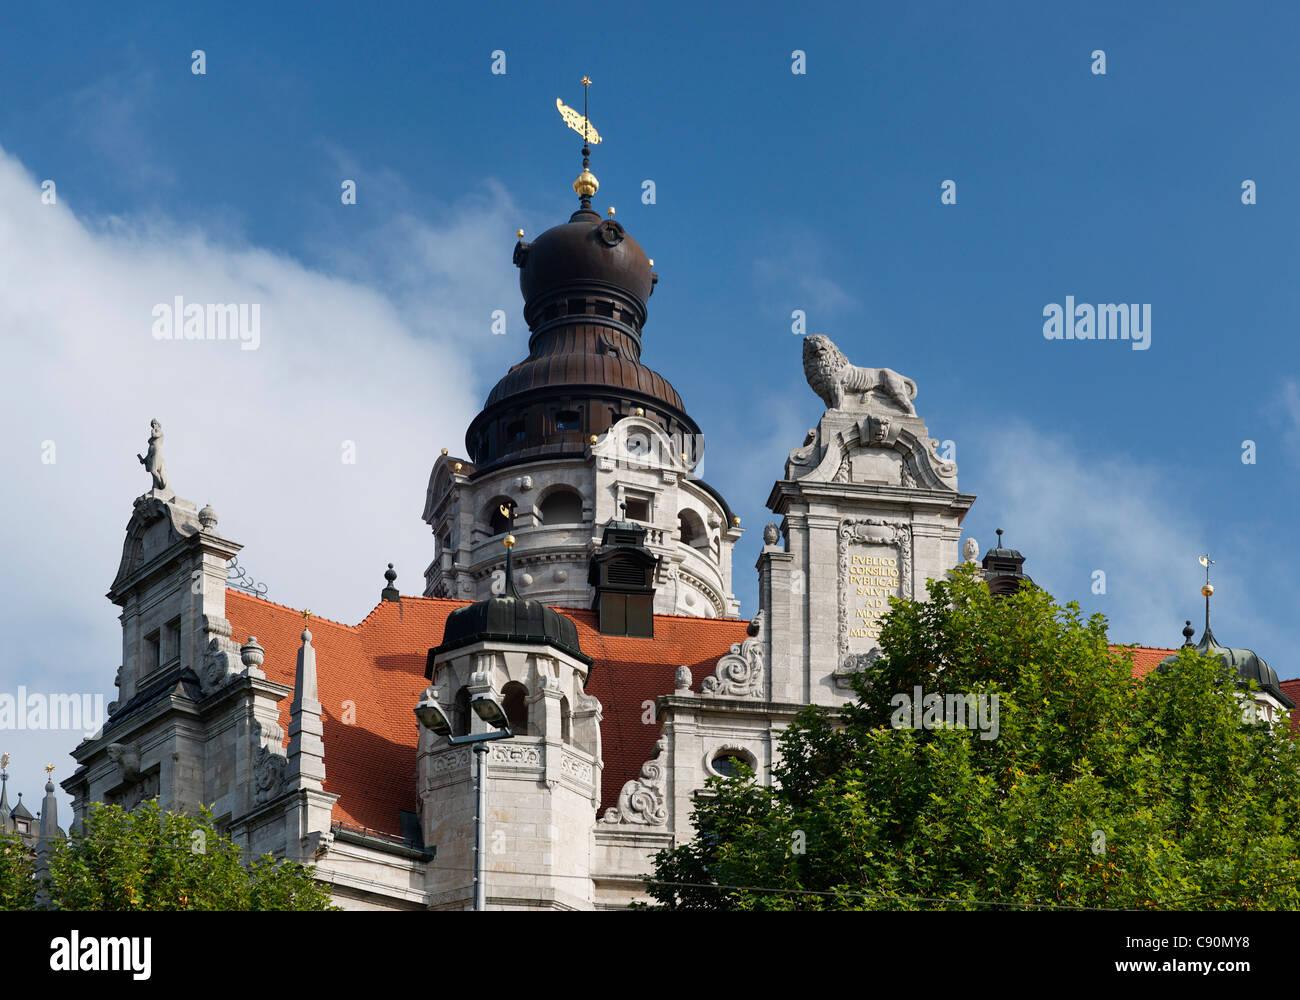 New City Hall, architect Hugo Licht, Leipzig, Saxony, Germany - Stock Image